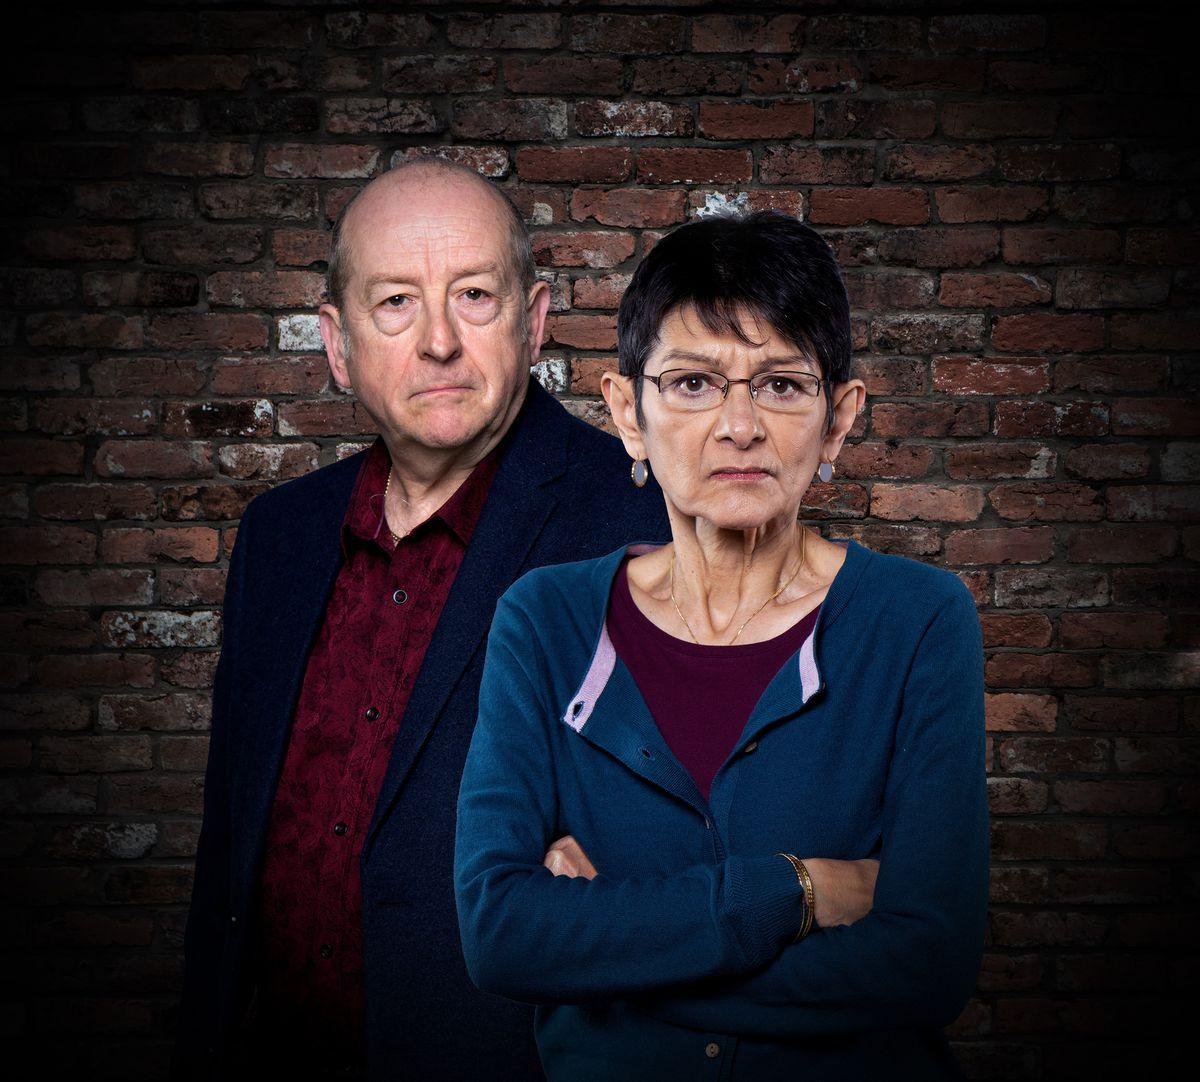 Ian Bartholemew as Geoff Metcalfe alongside Shelley King as Yasmeen Matcalfe in Coronation Street